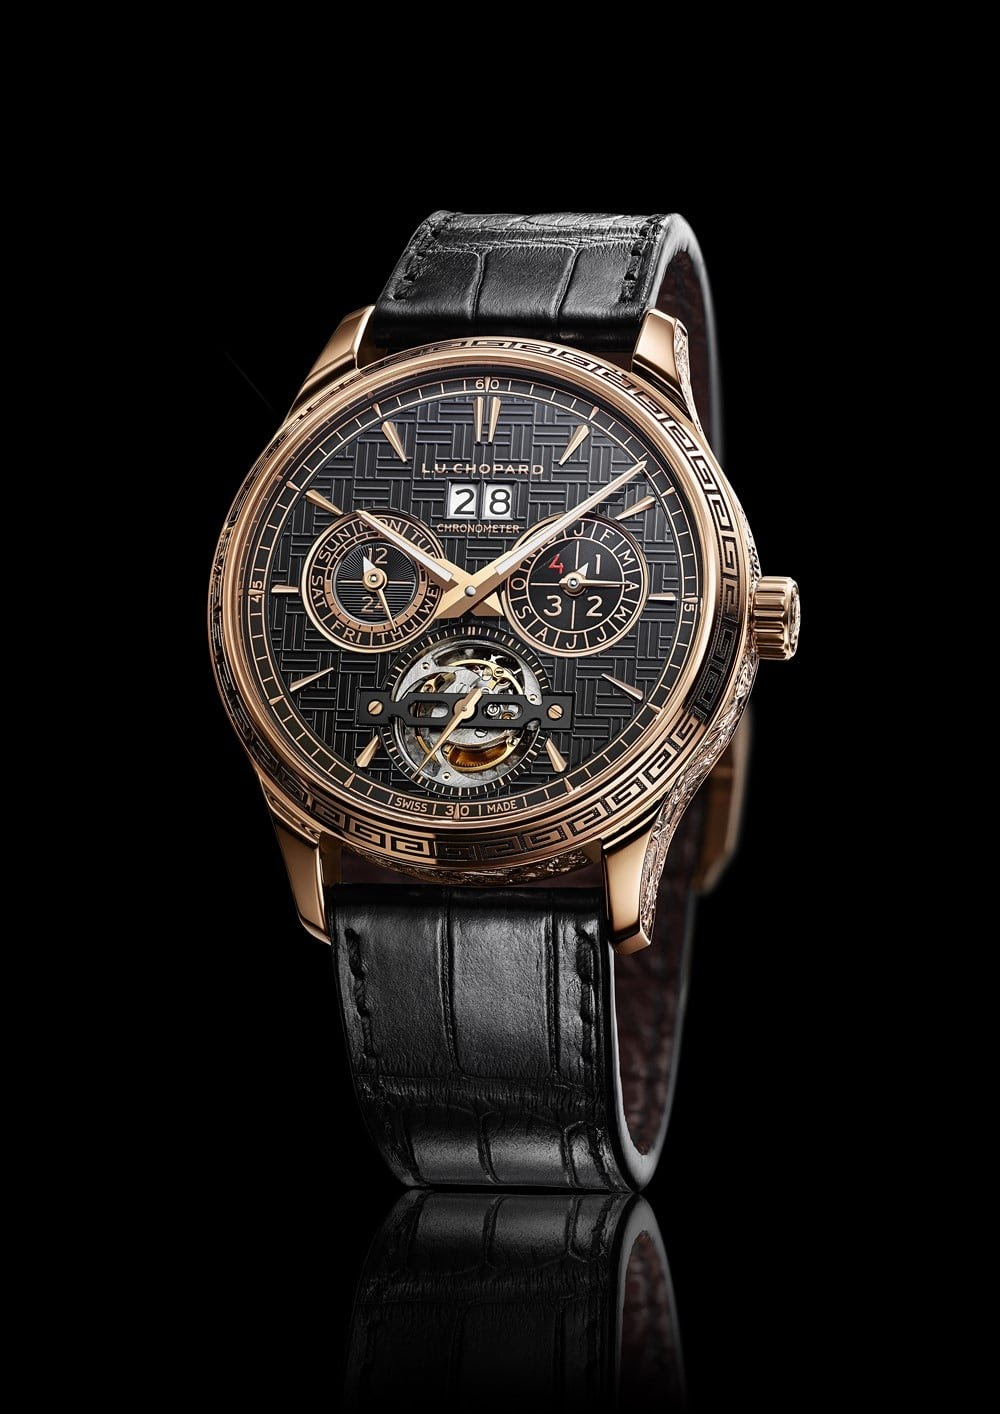 L.U.C Perpetual T-Spirit of the Chinese Zodiac : une montre unique